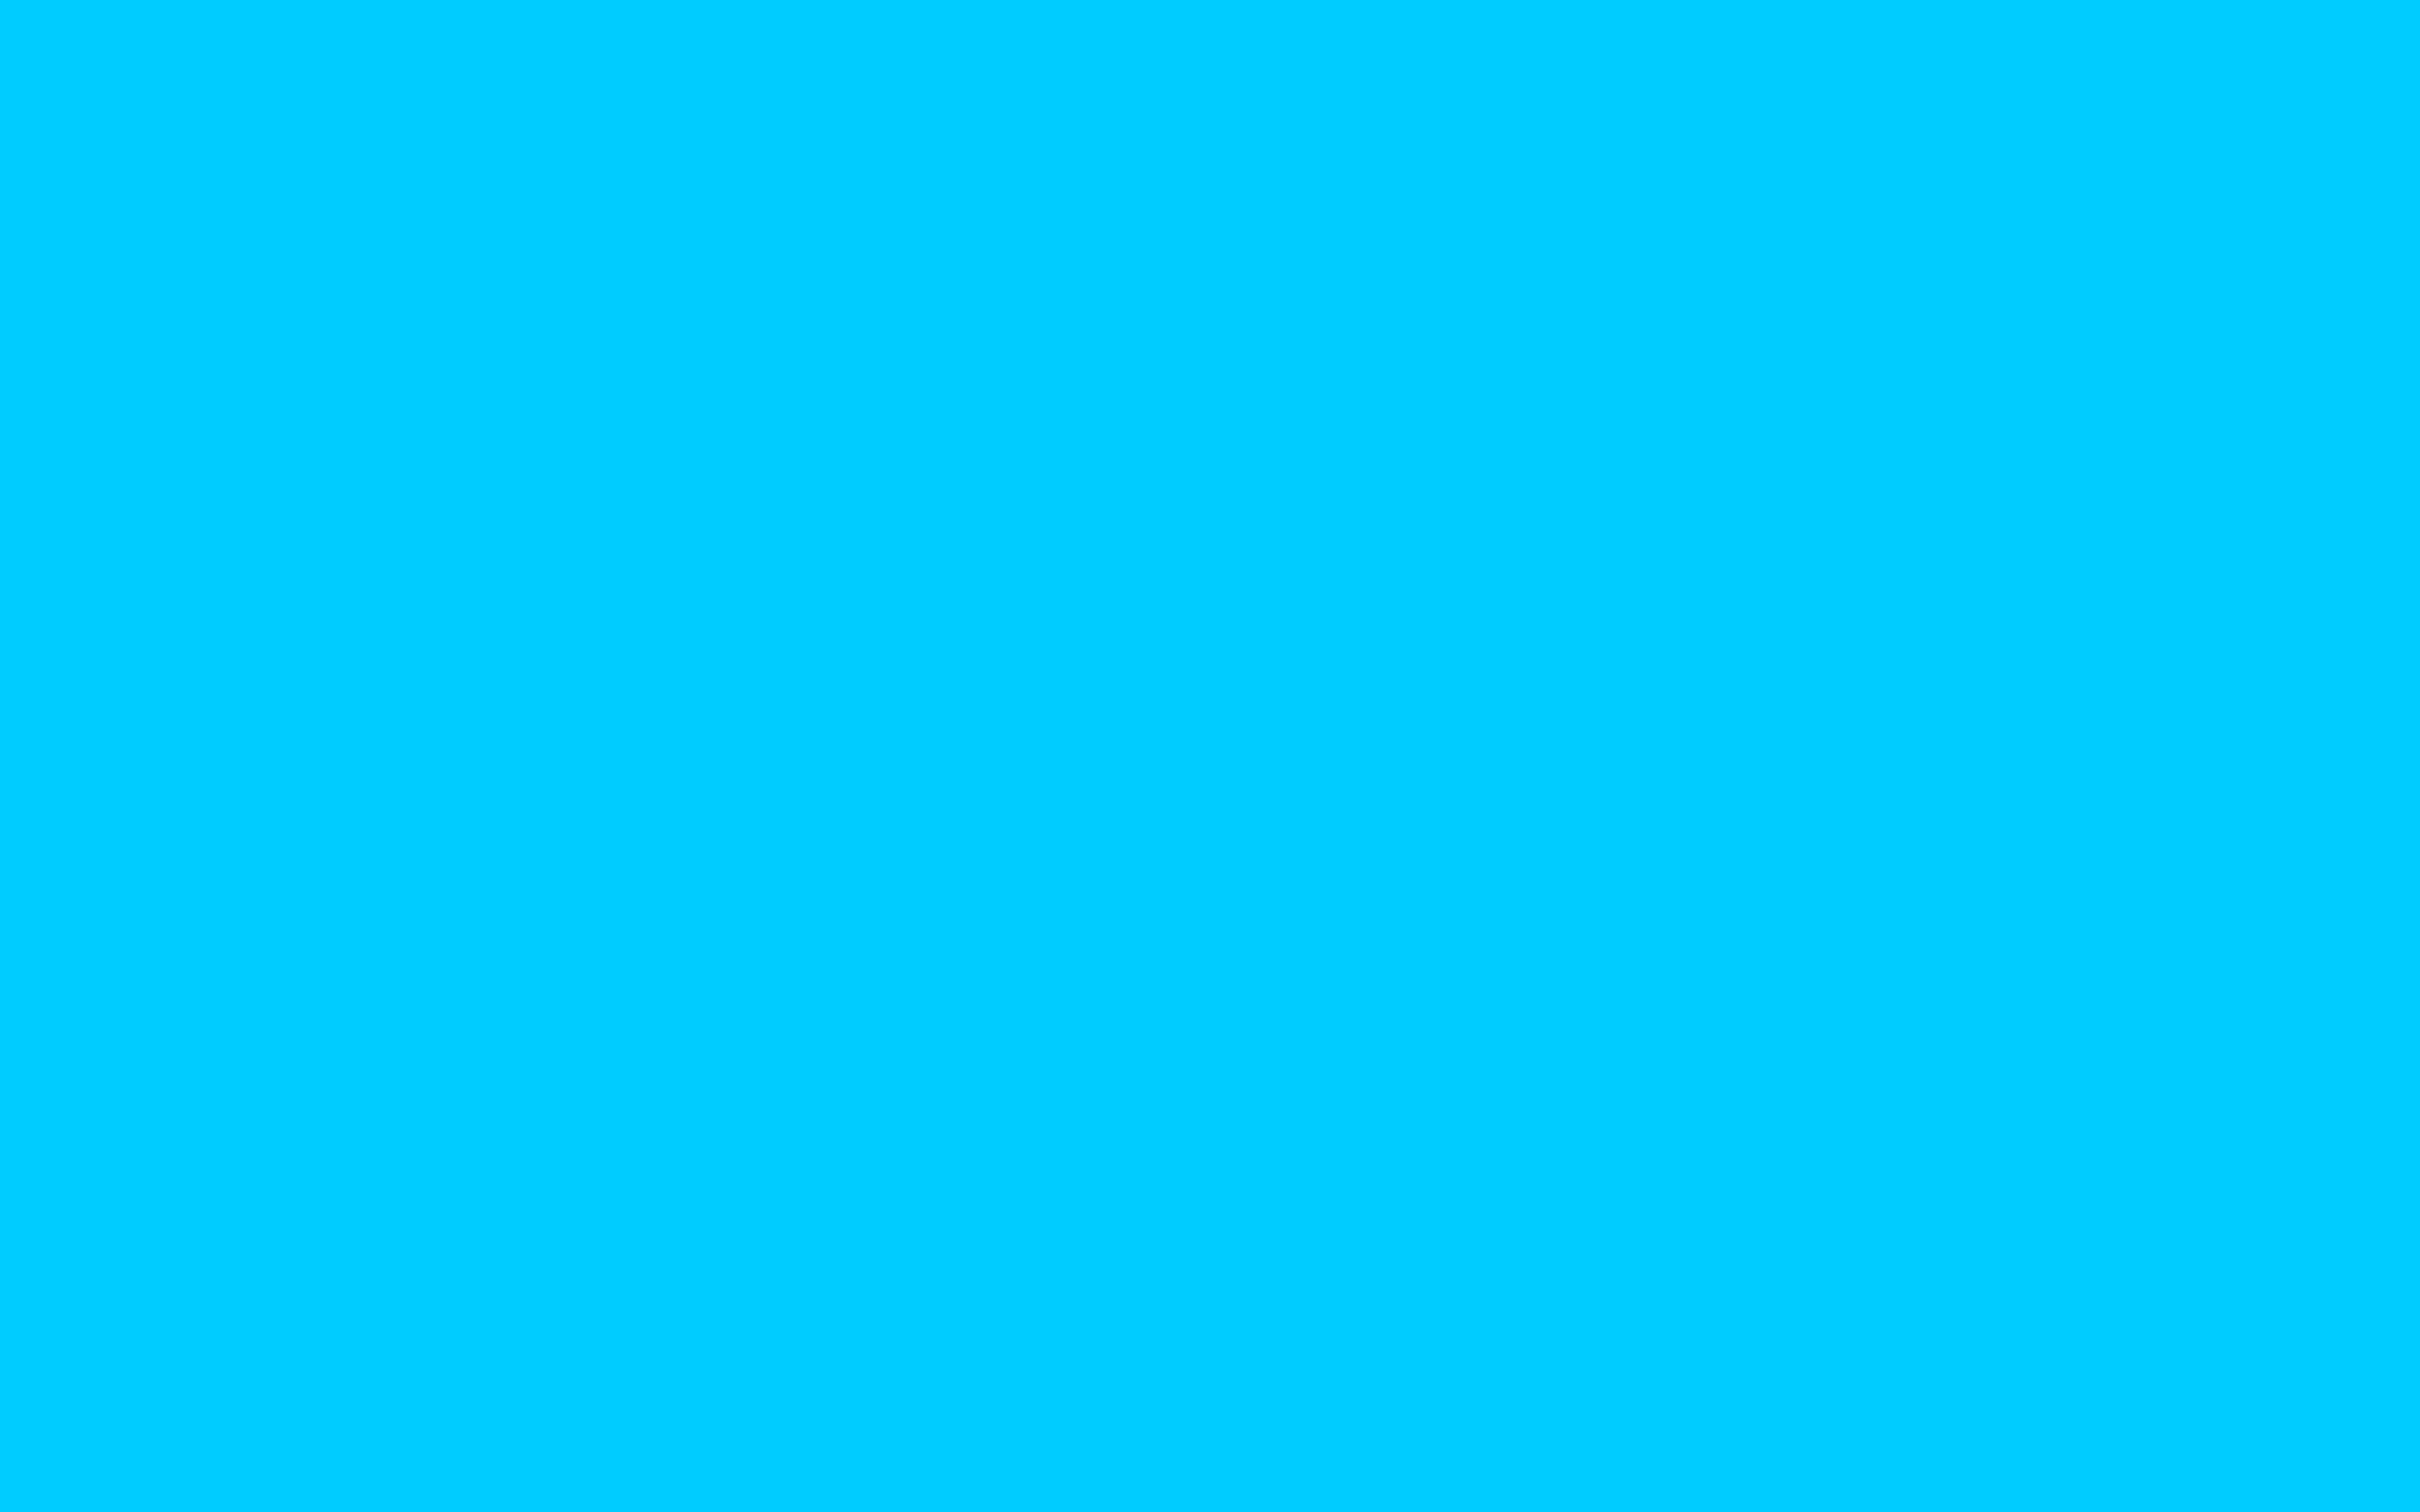 Vivid Sky Blue Solid Color Background